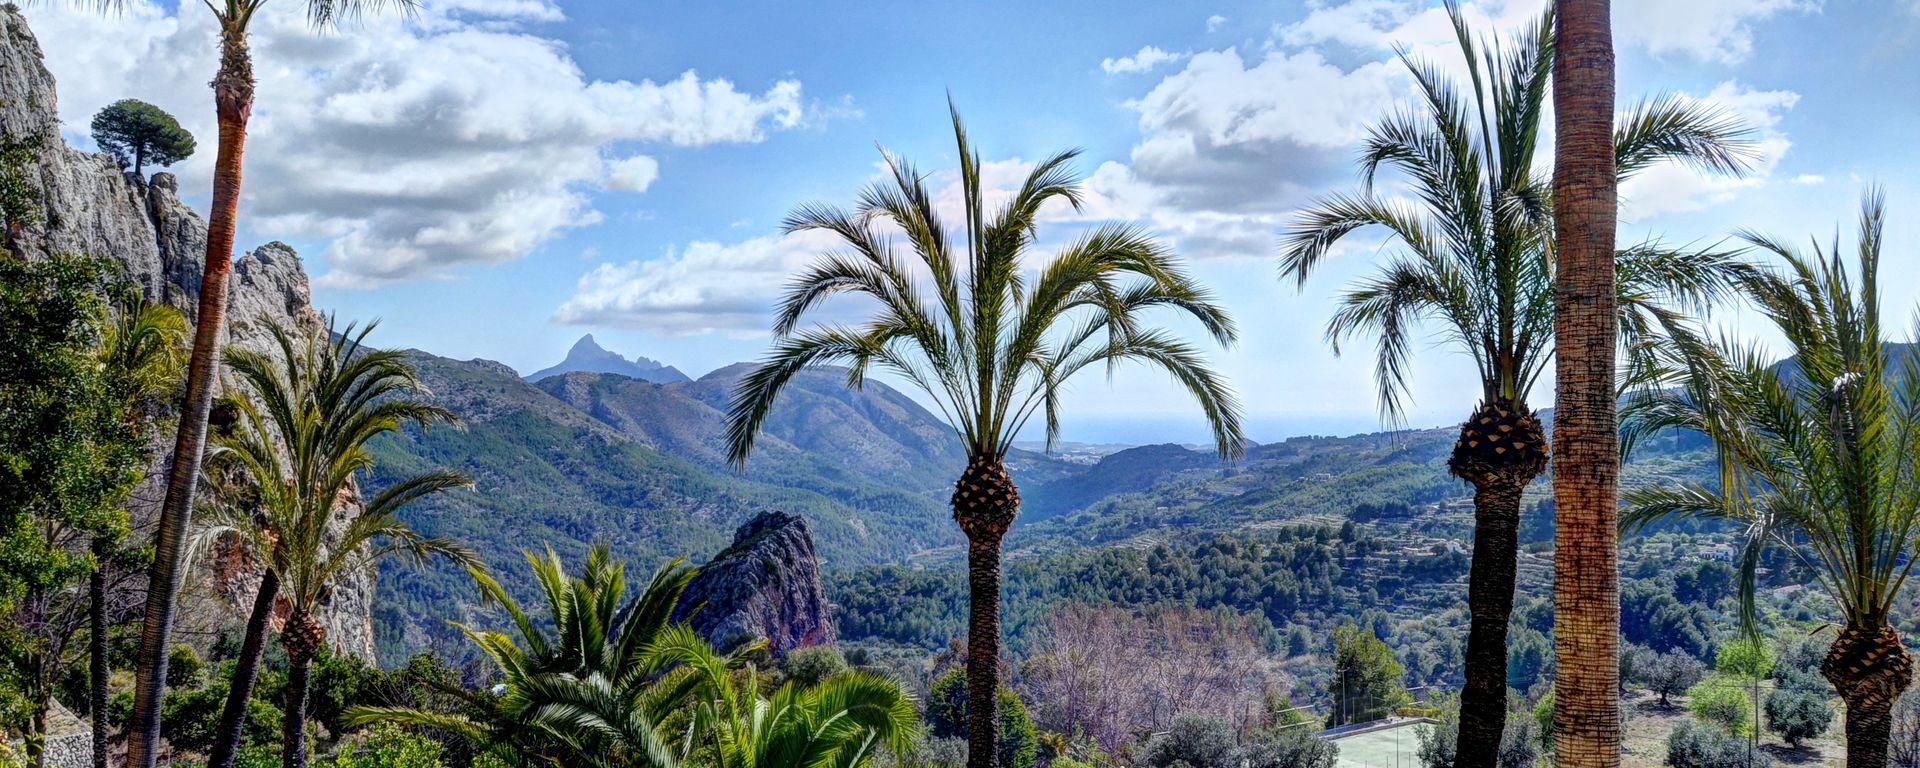 Costa Blanca - paradis sur terre